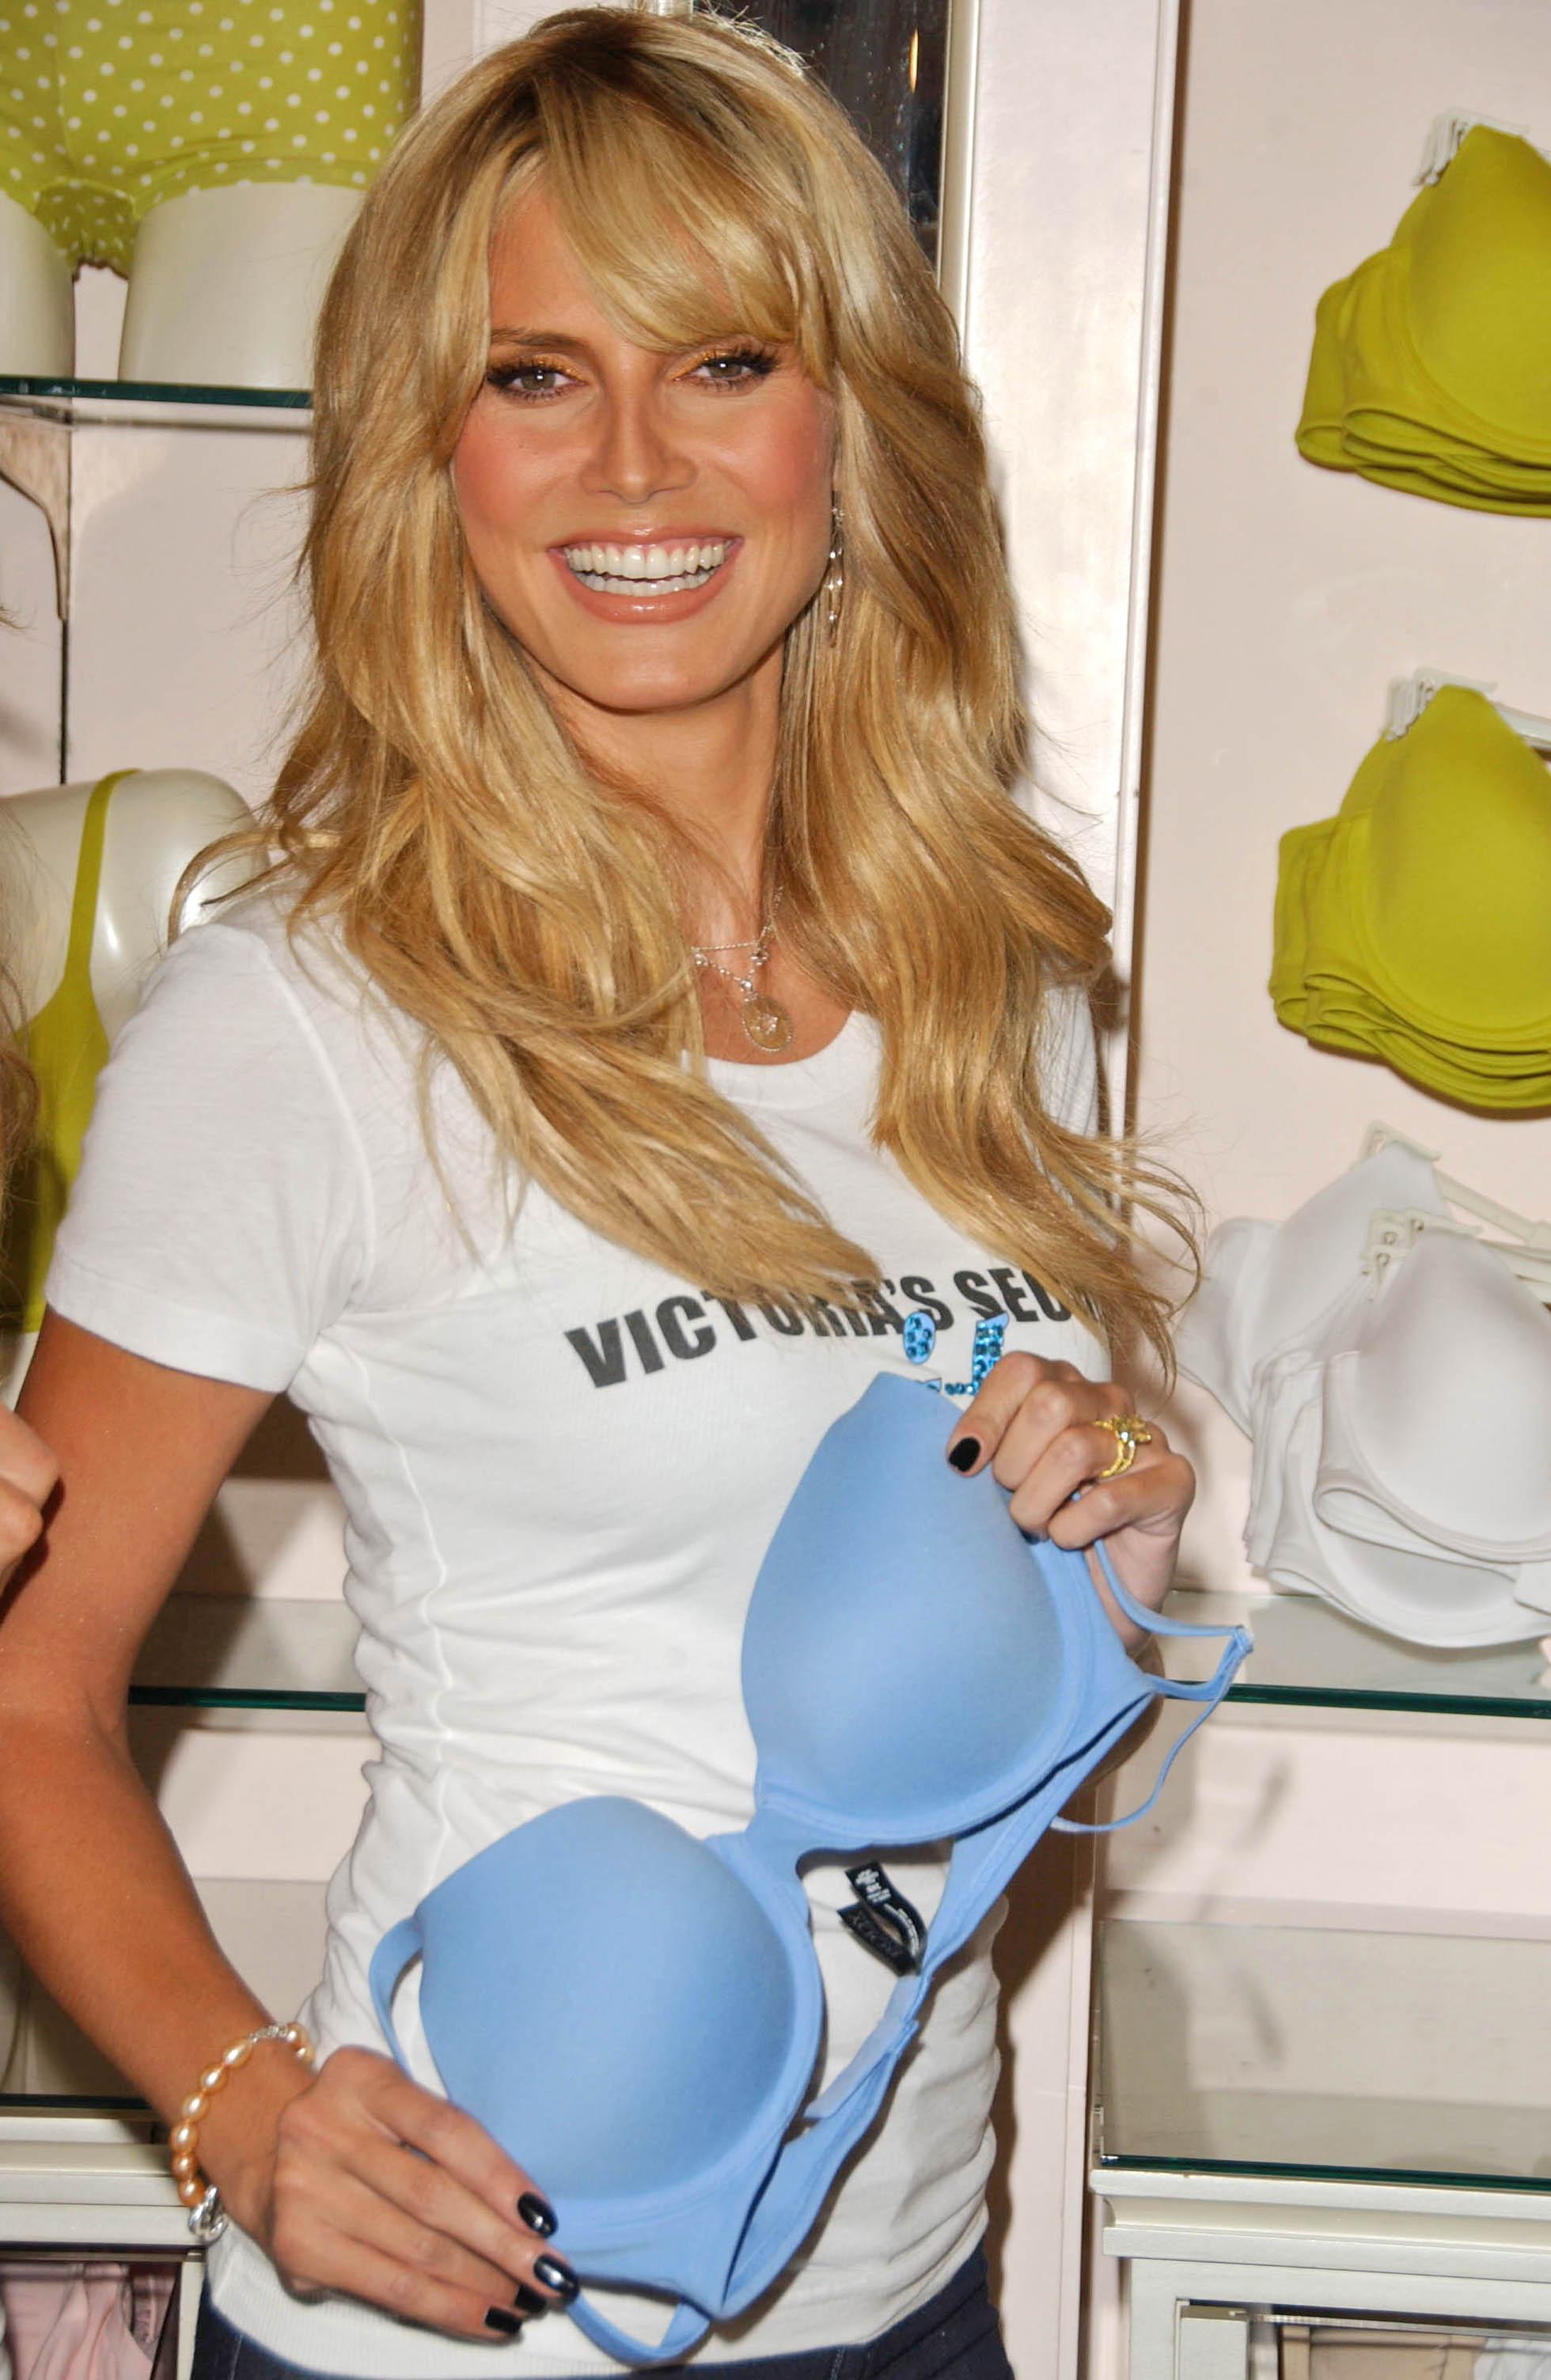 Famous German Supermodel Heidi Klum Modeling In Los Angeles California Modeling For Victoria's Secret.